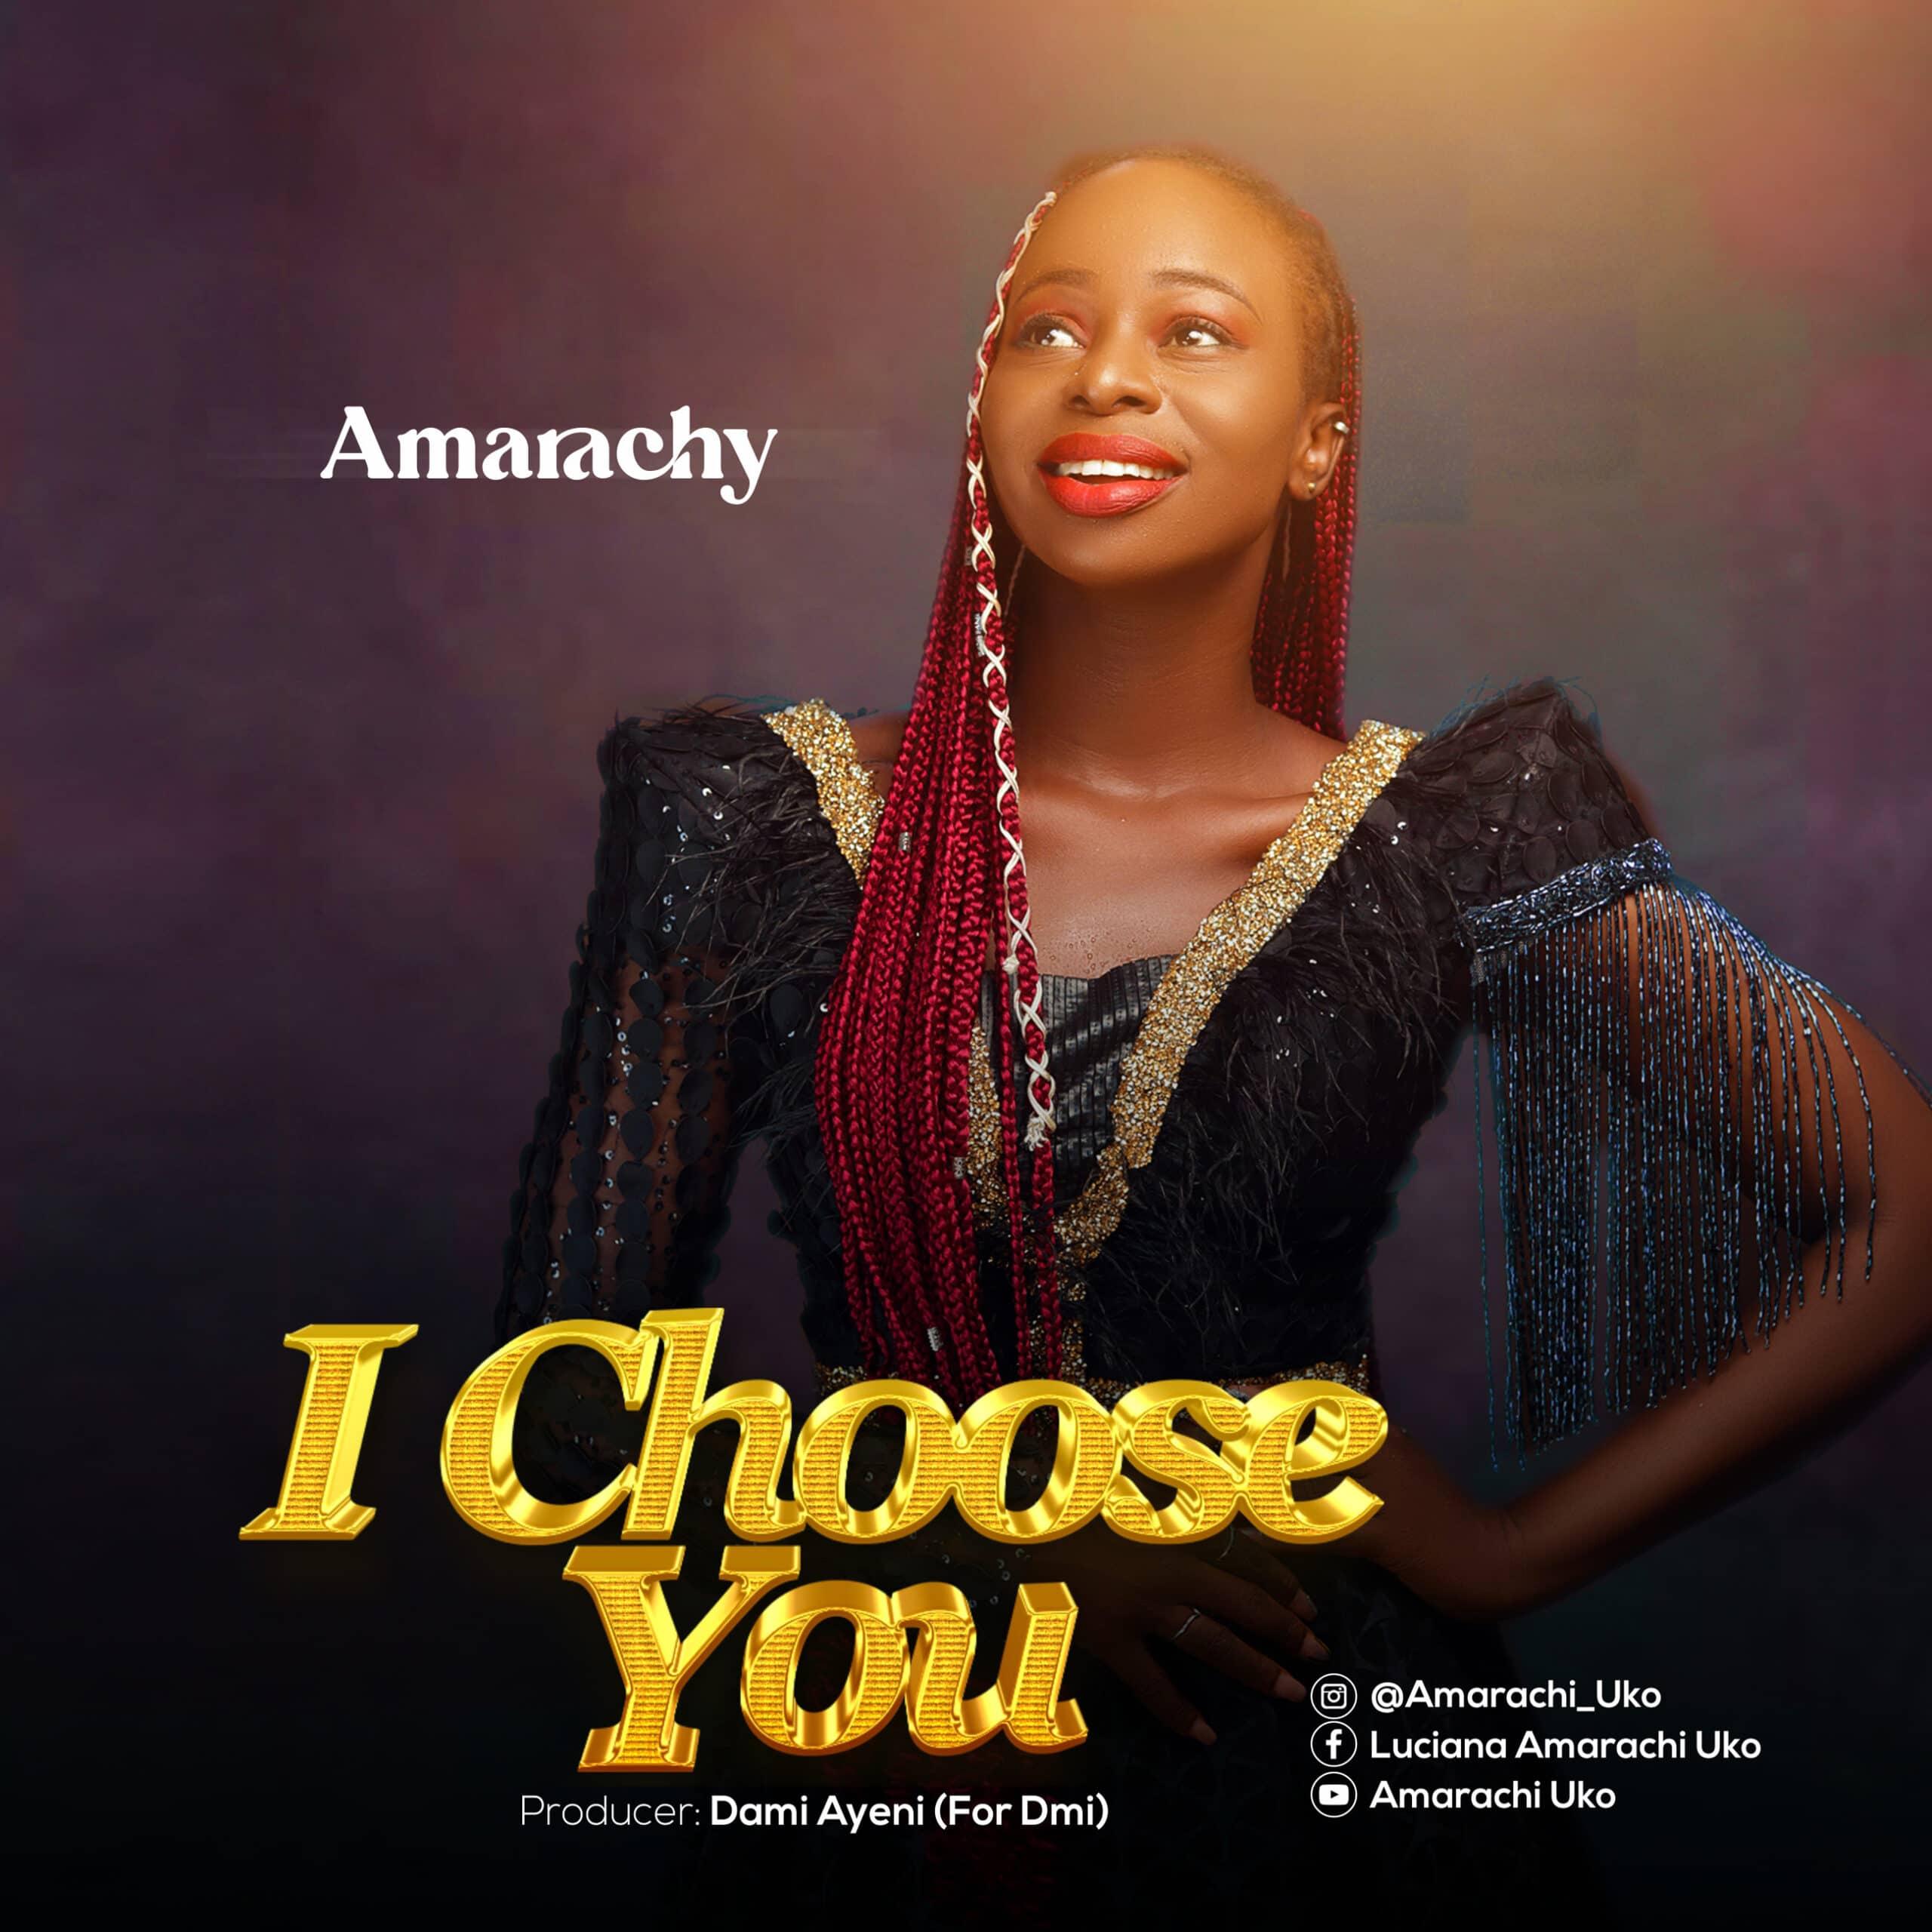 Amarachy - I Choose You